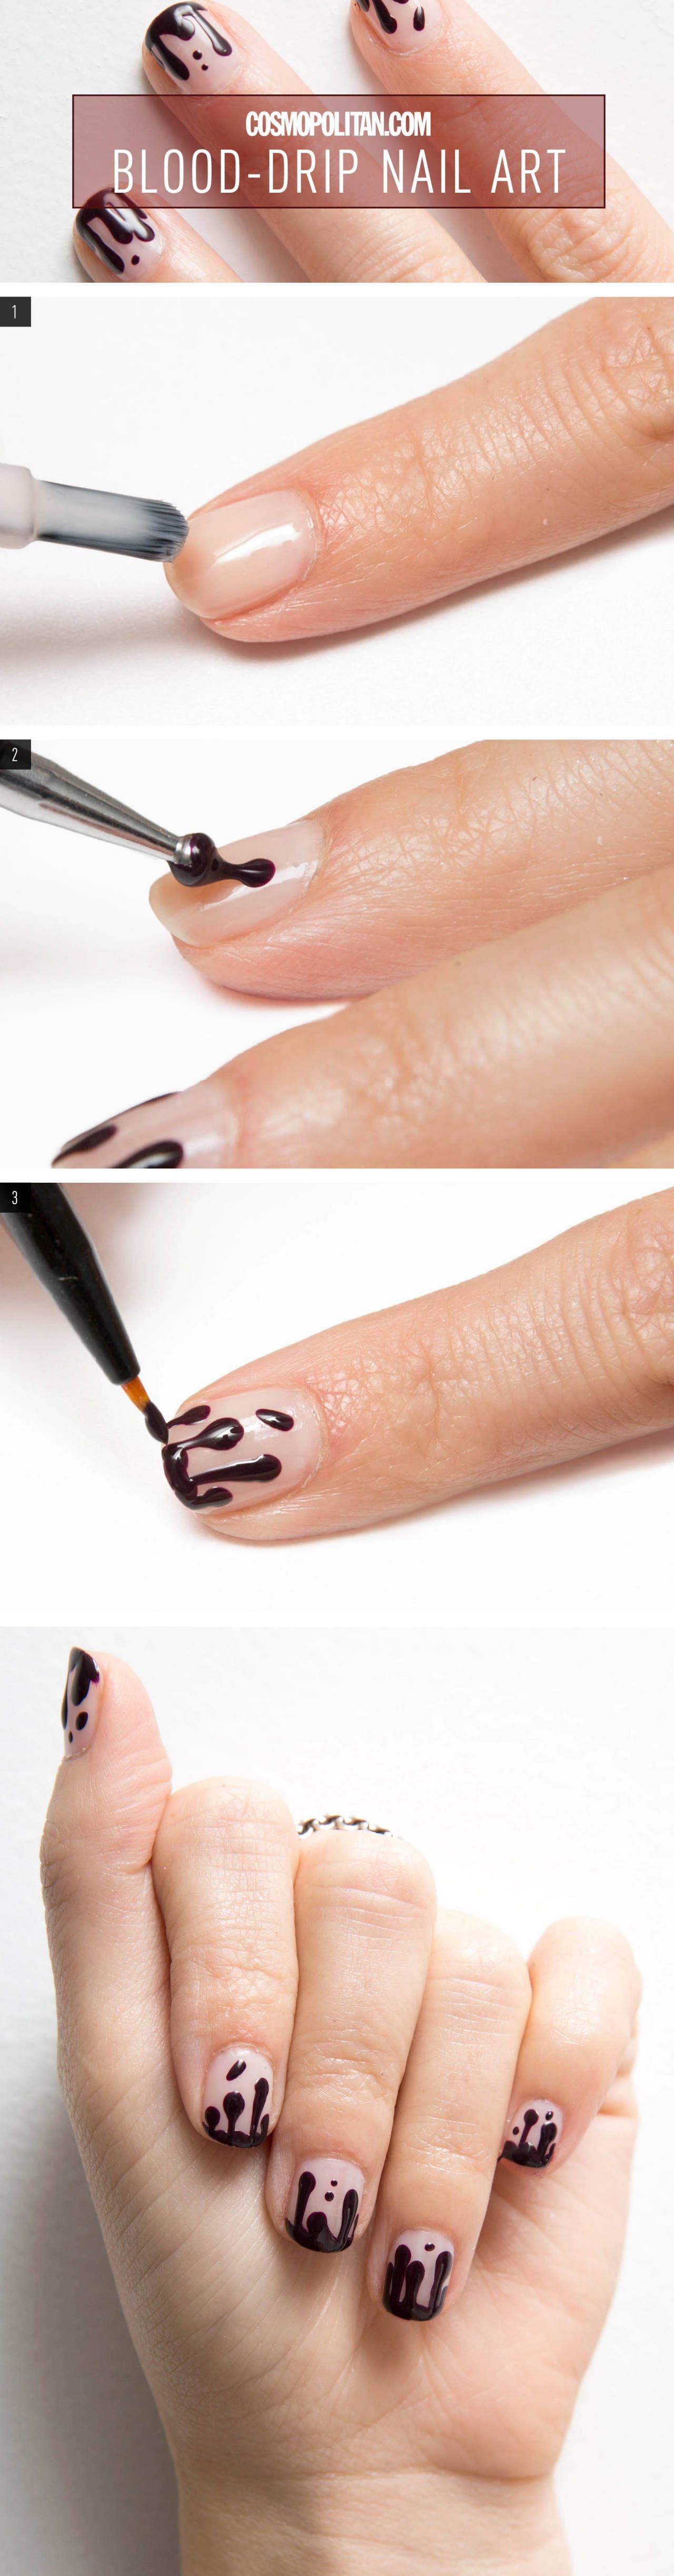 to wear - Nail simple art prabal gurung video